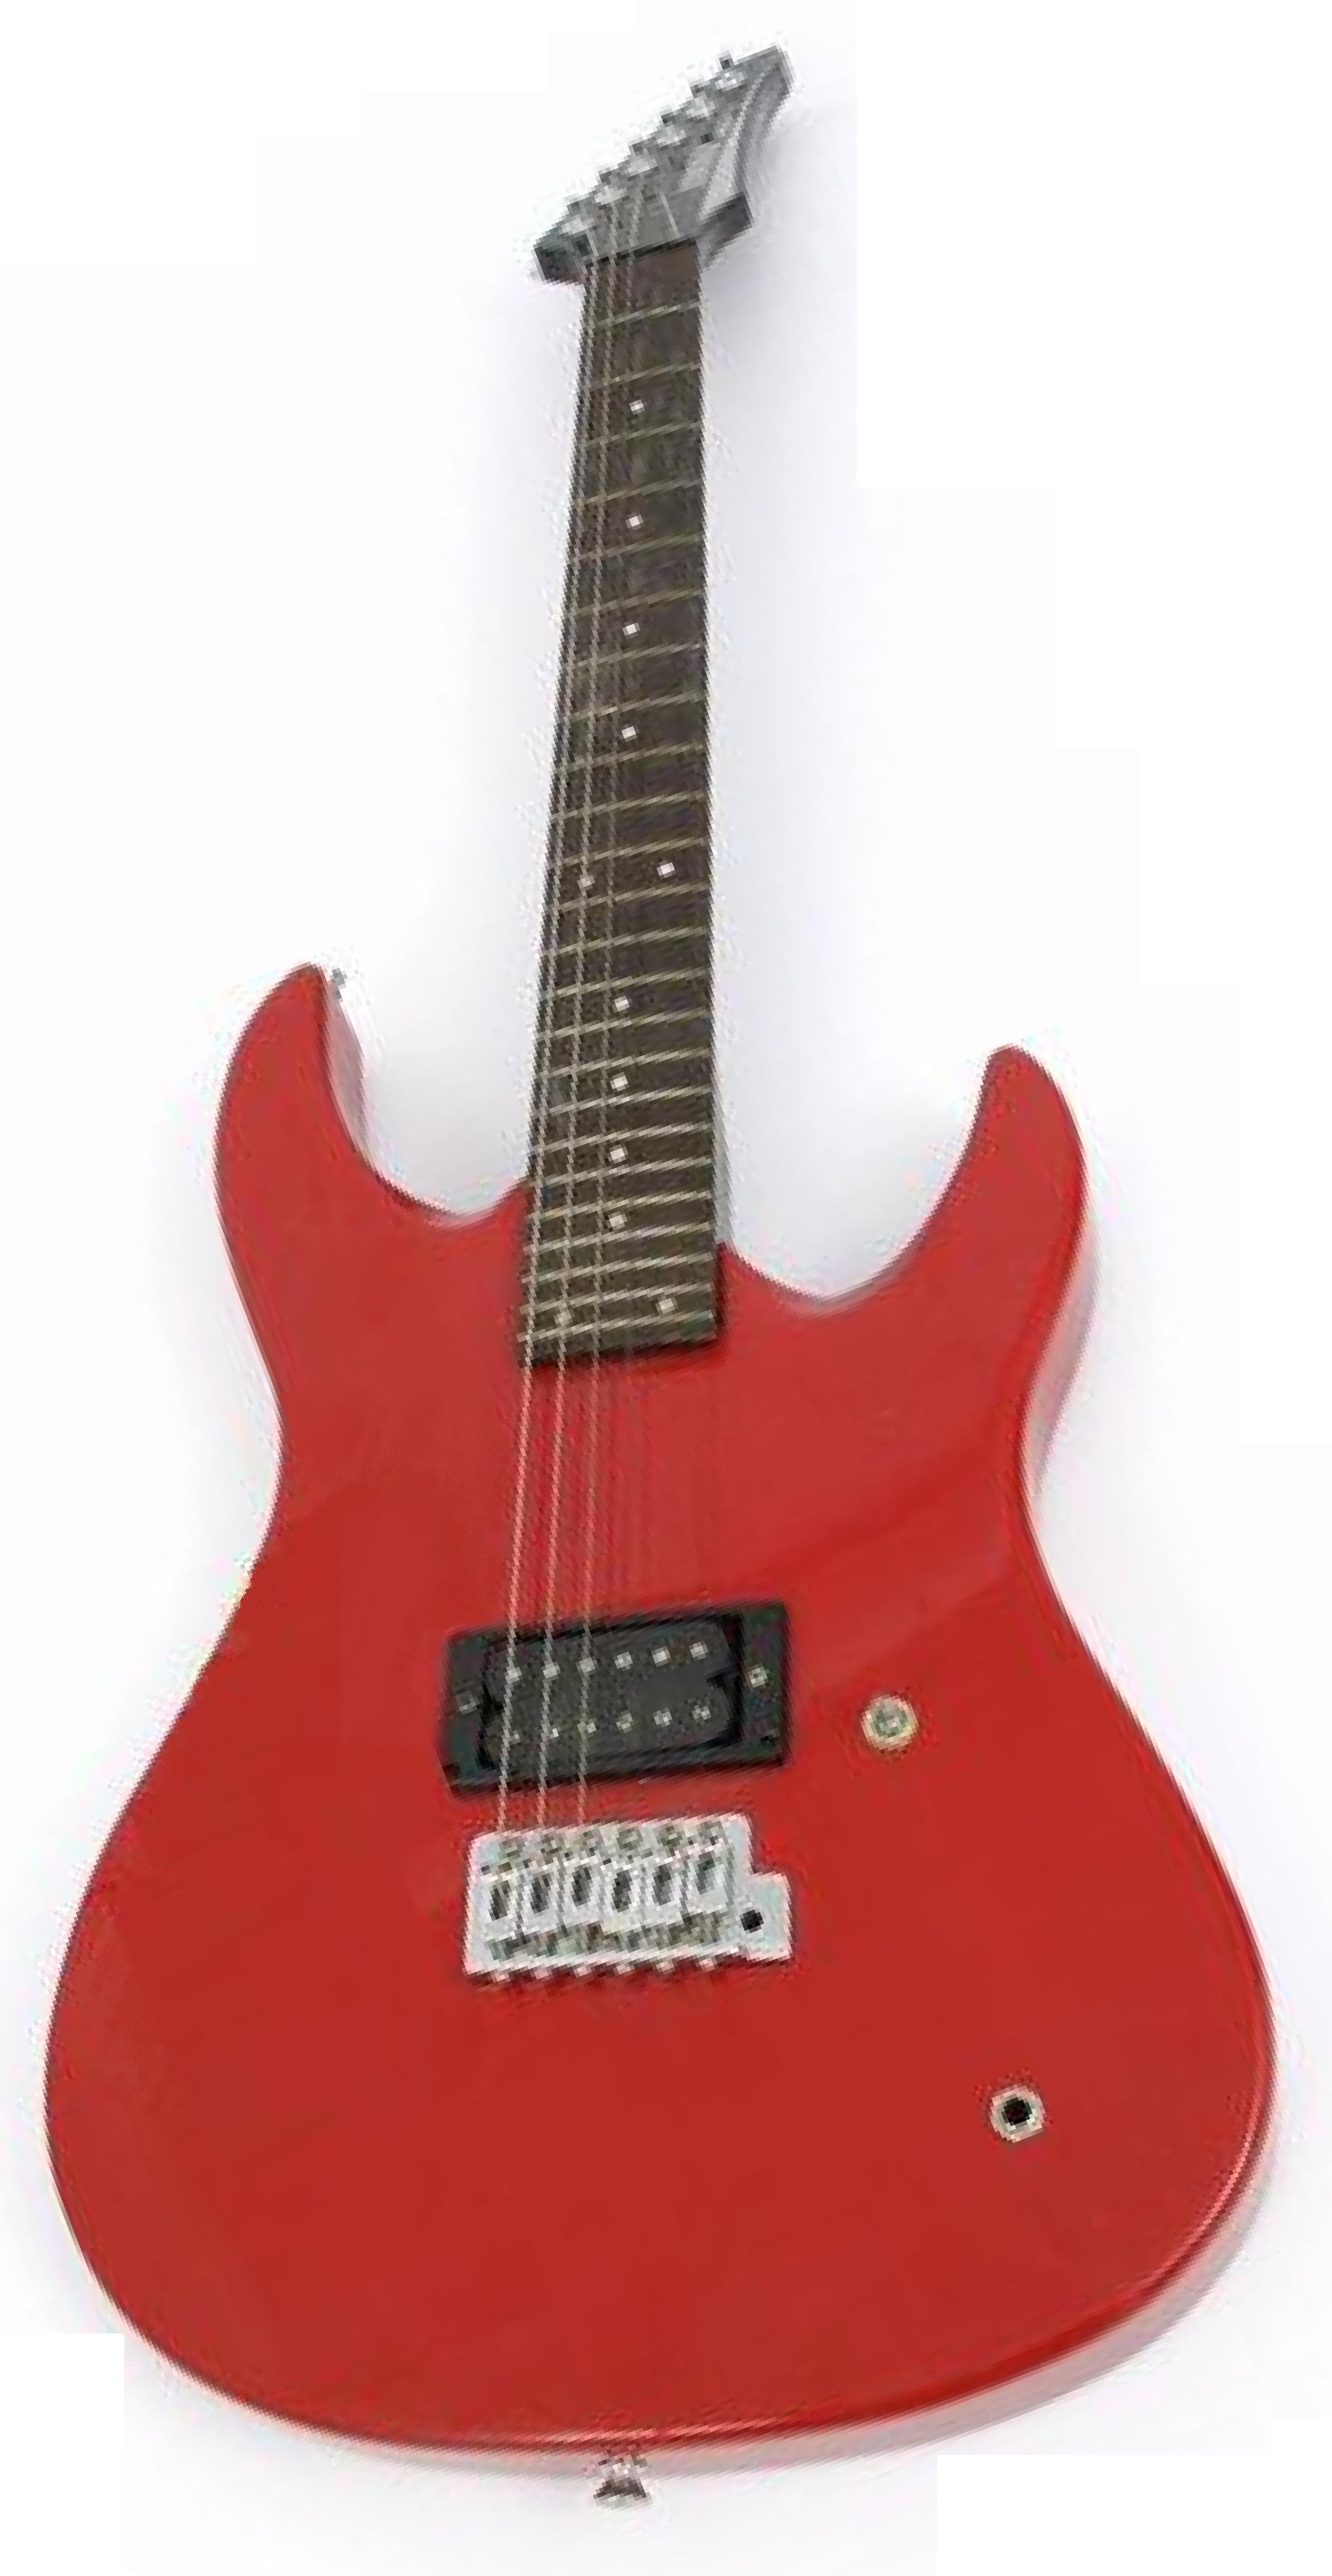 Yamaha Electric Guitars Old Models